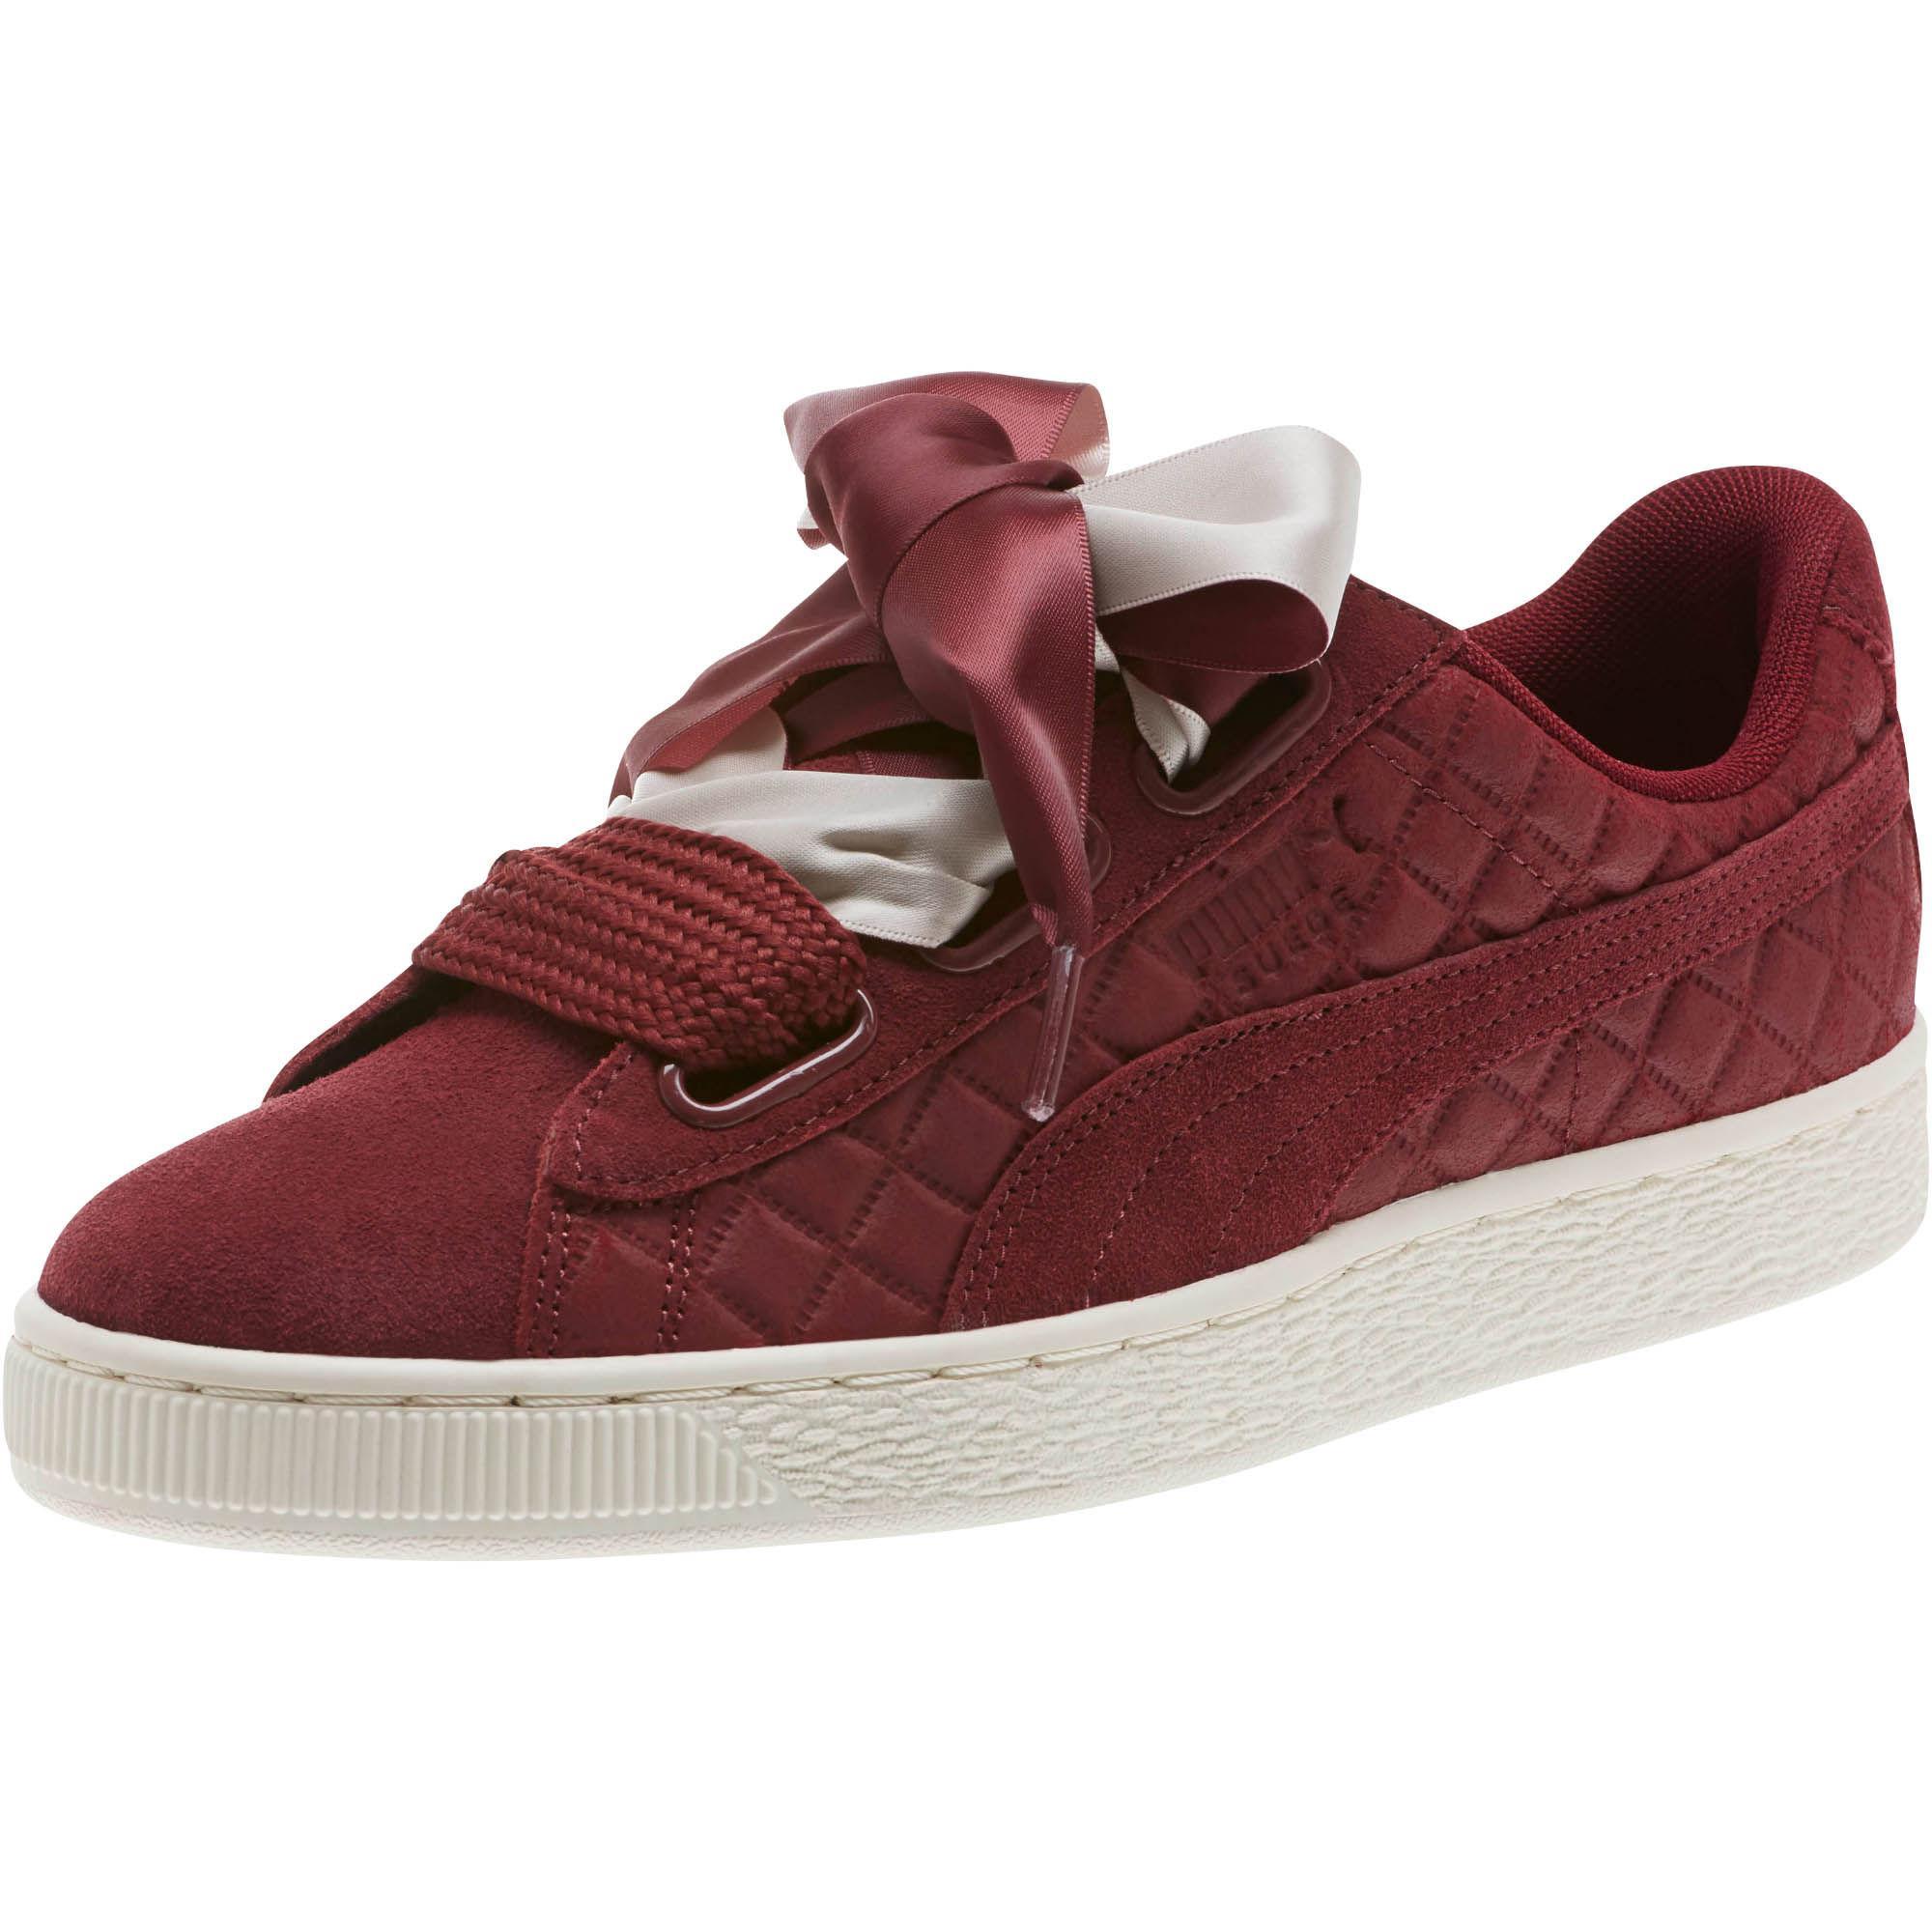 6e947ce1b8f34c Lyst - PUMA Suede Heart Quilt Women s Sneakers